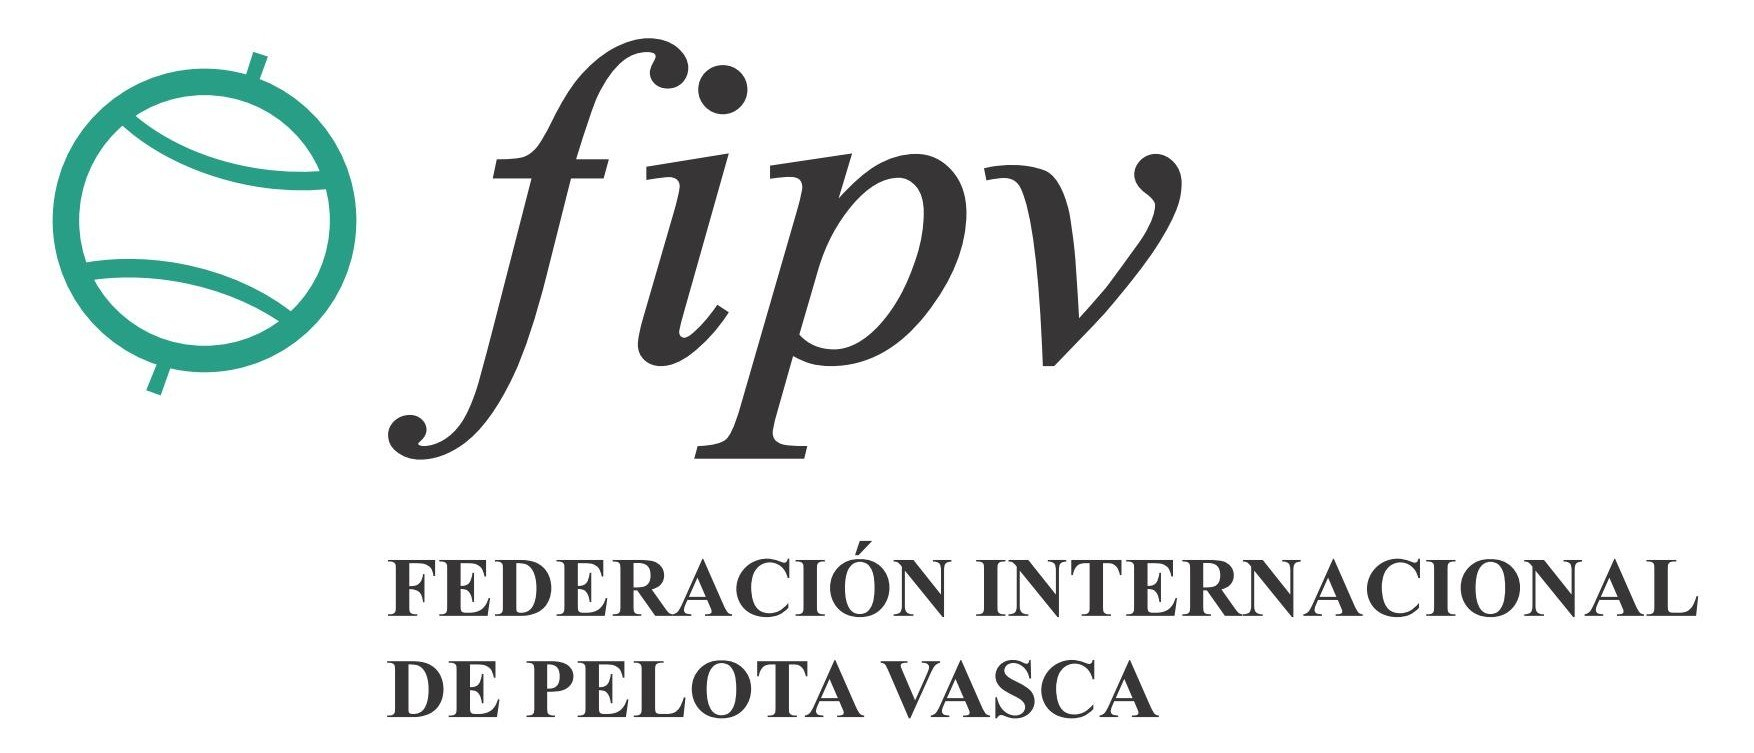 Fédération Internationale de Pelota Vasca (FIPV) Logo png